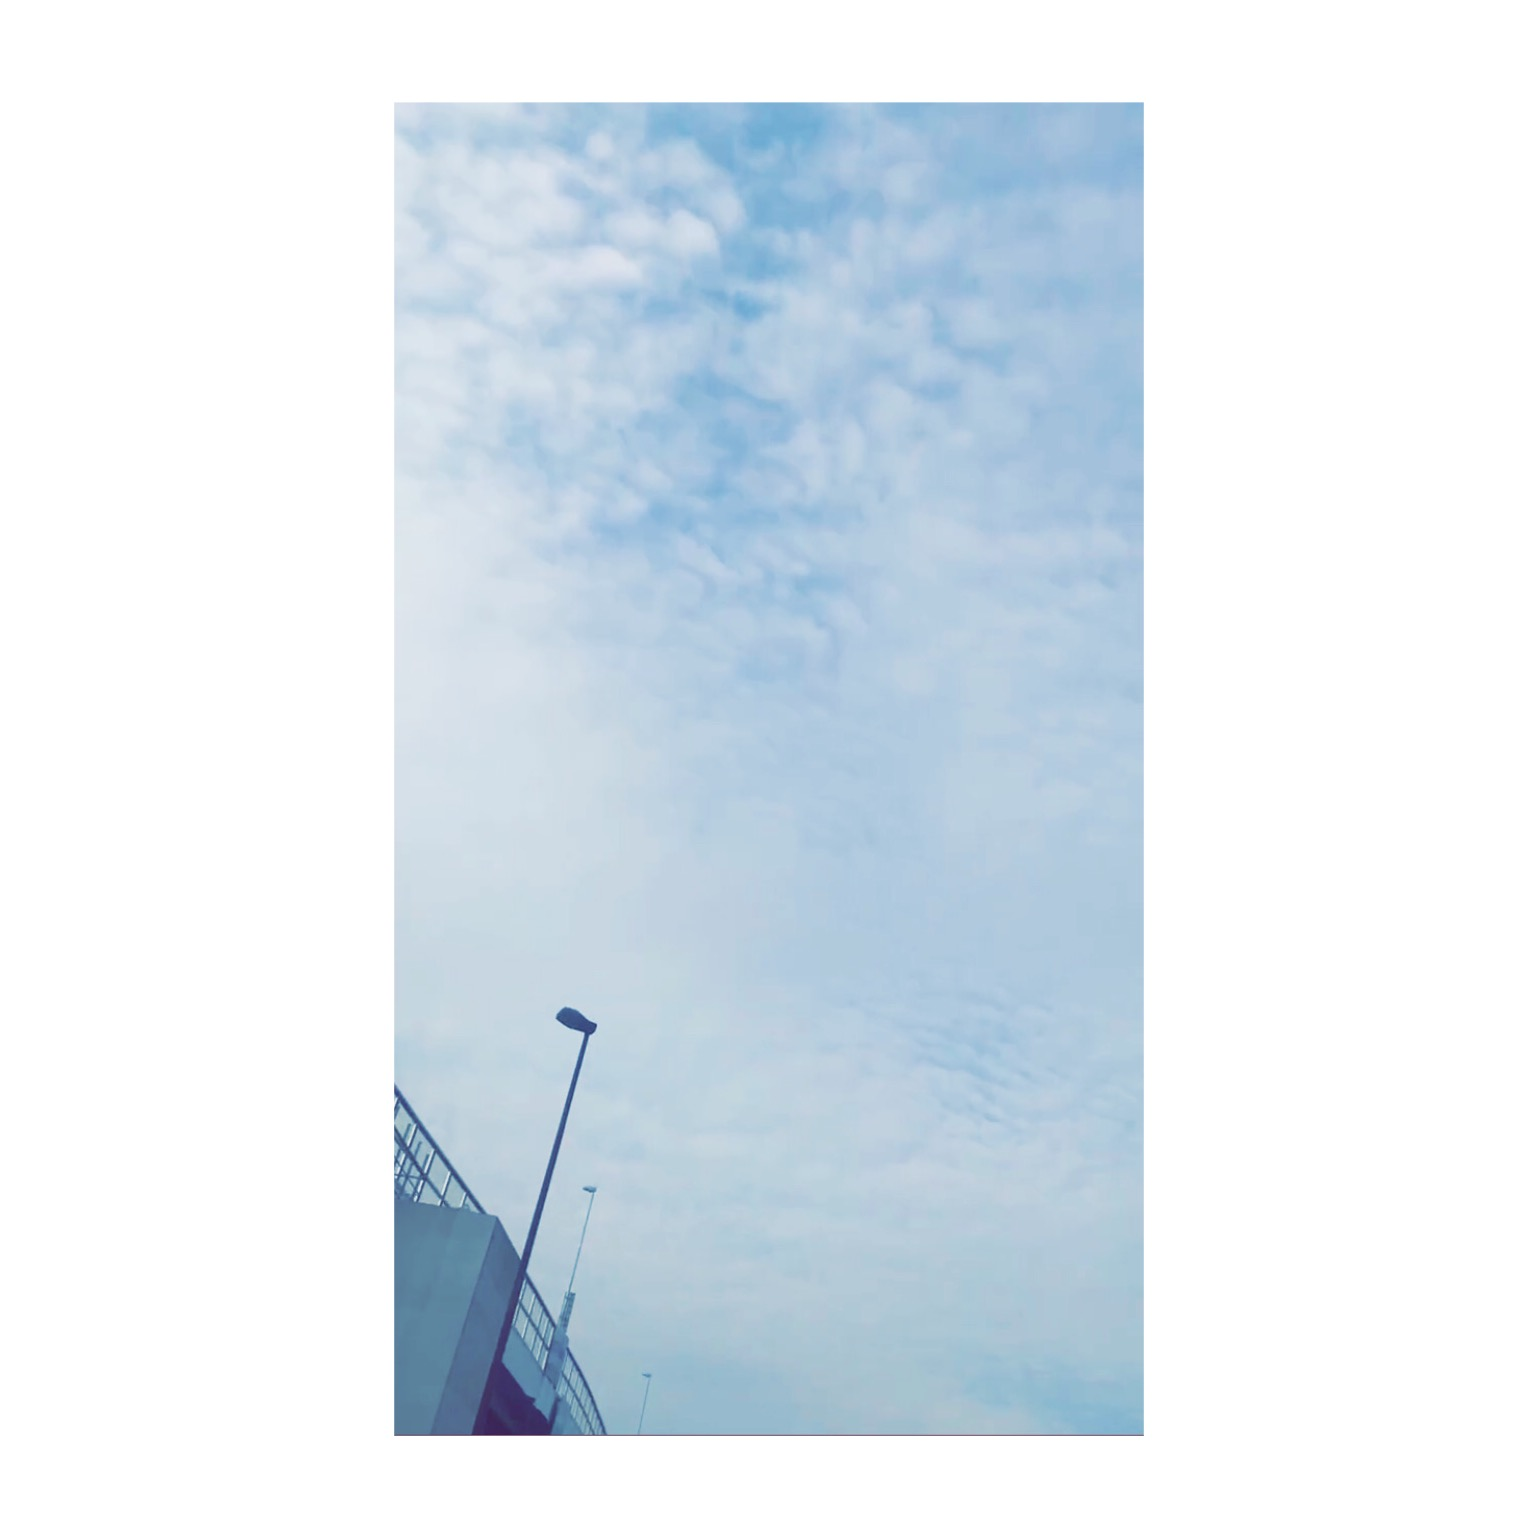 IMG_8802